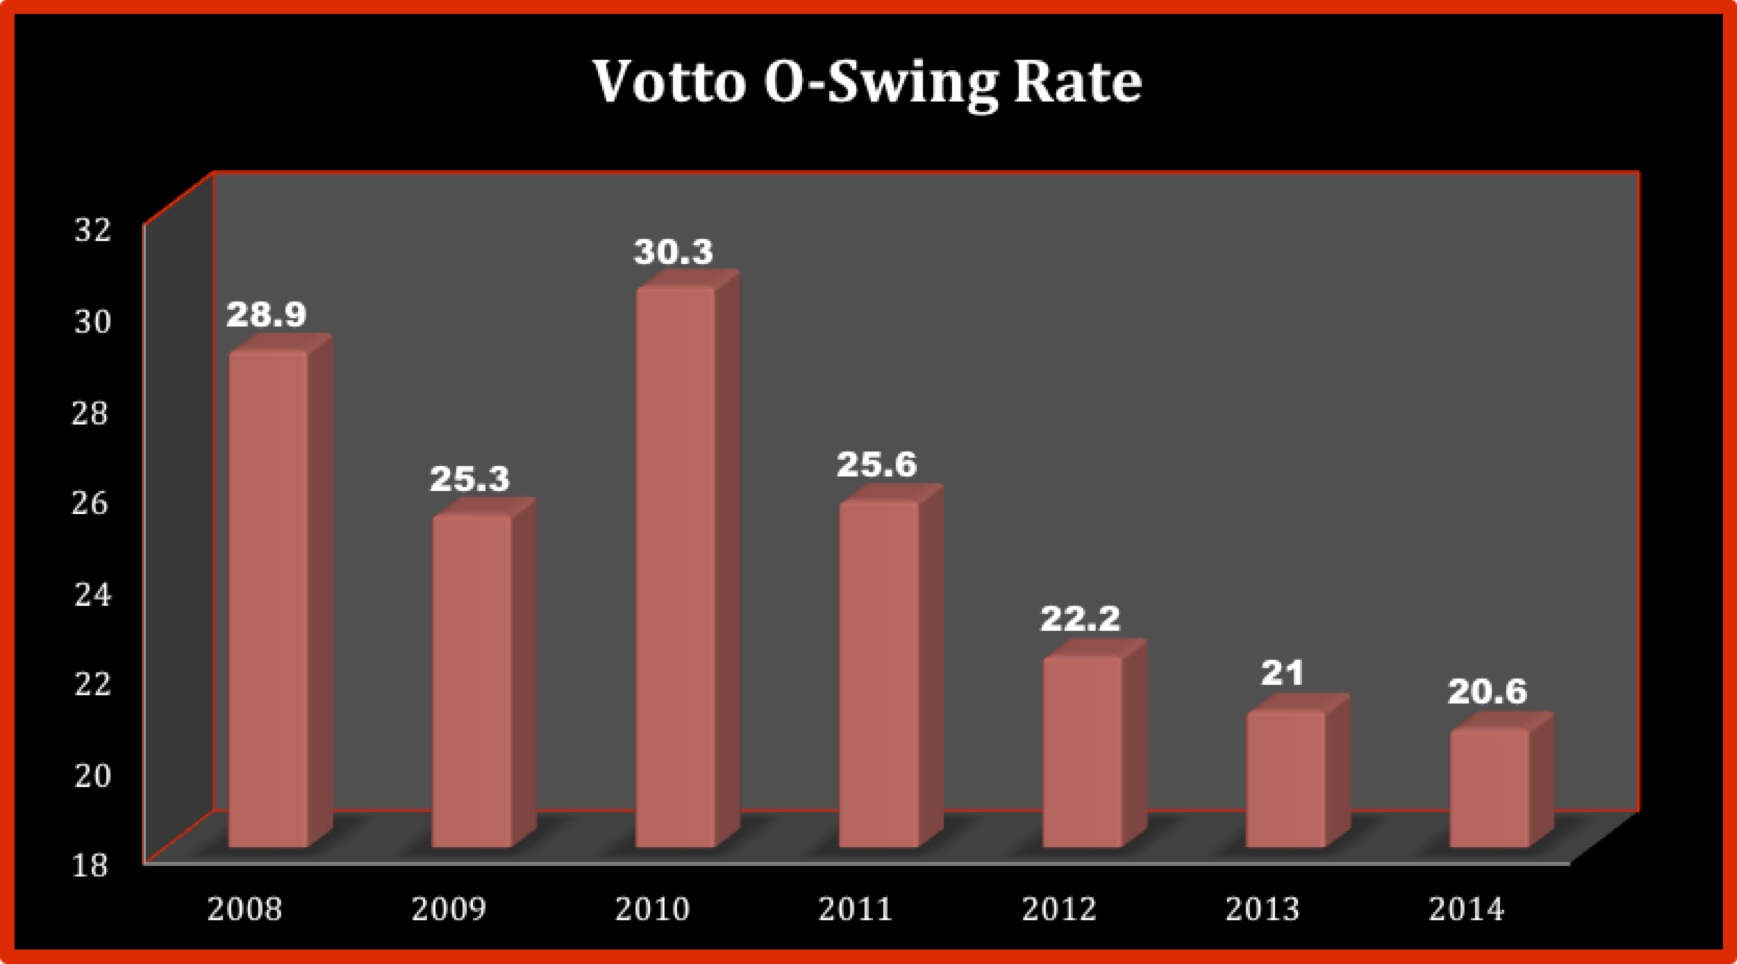 VottoOSwing